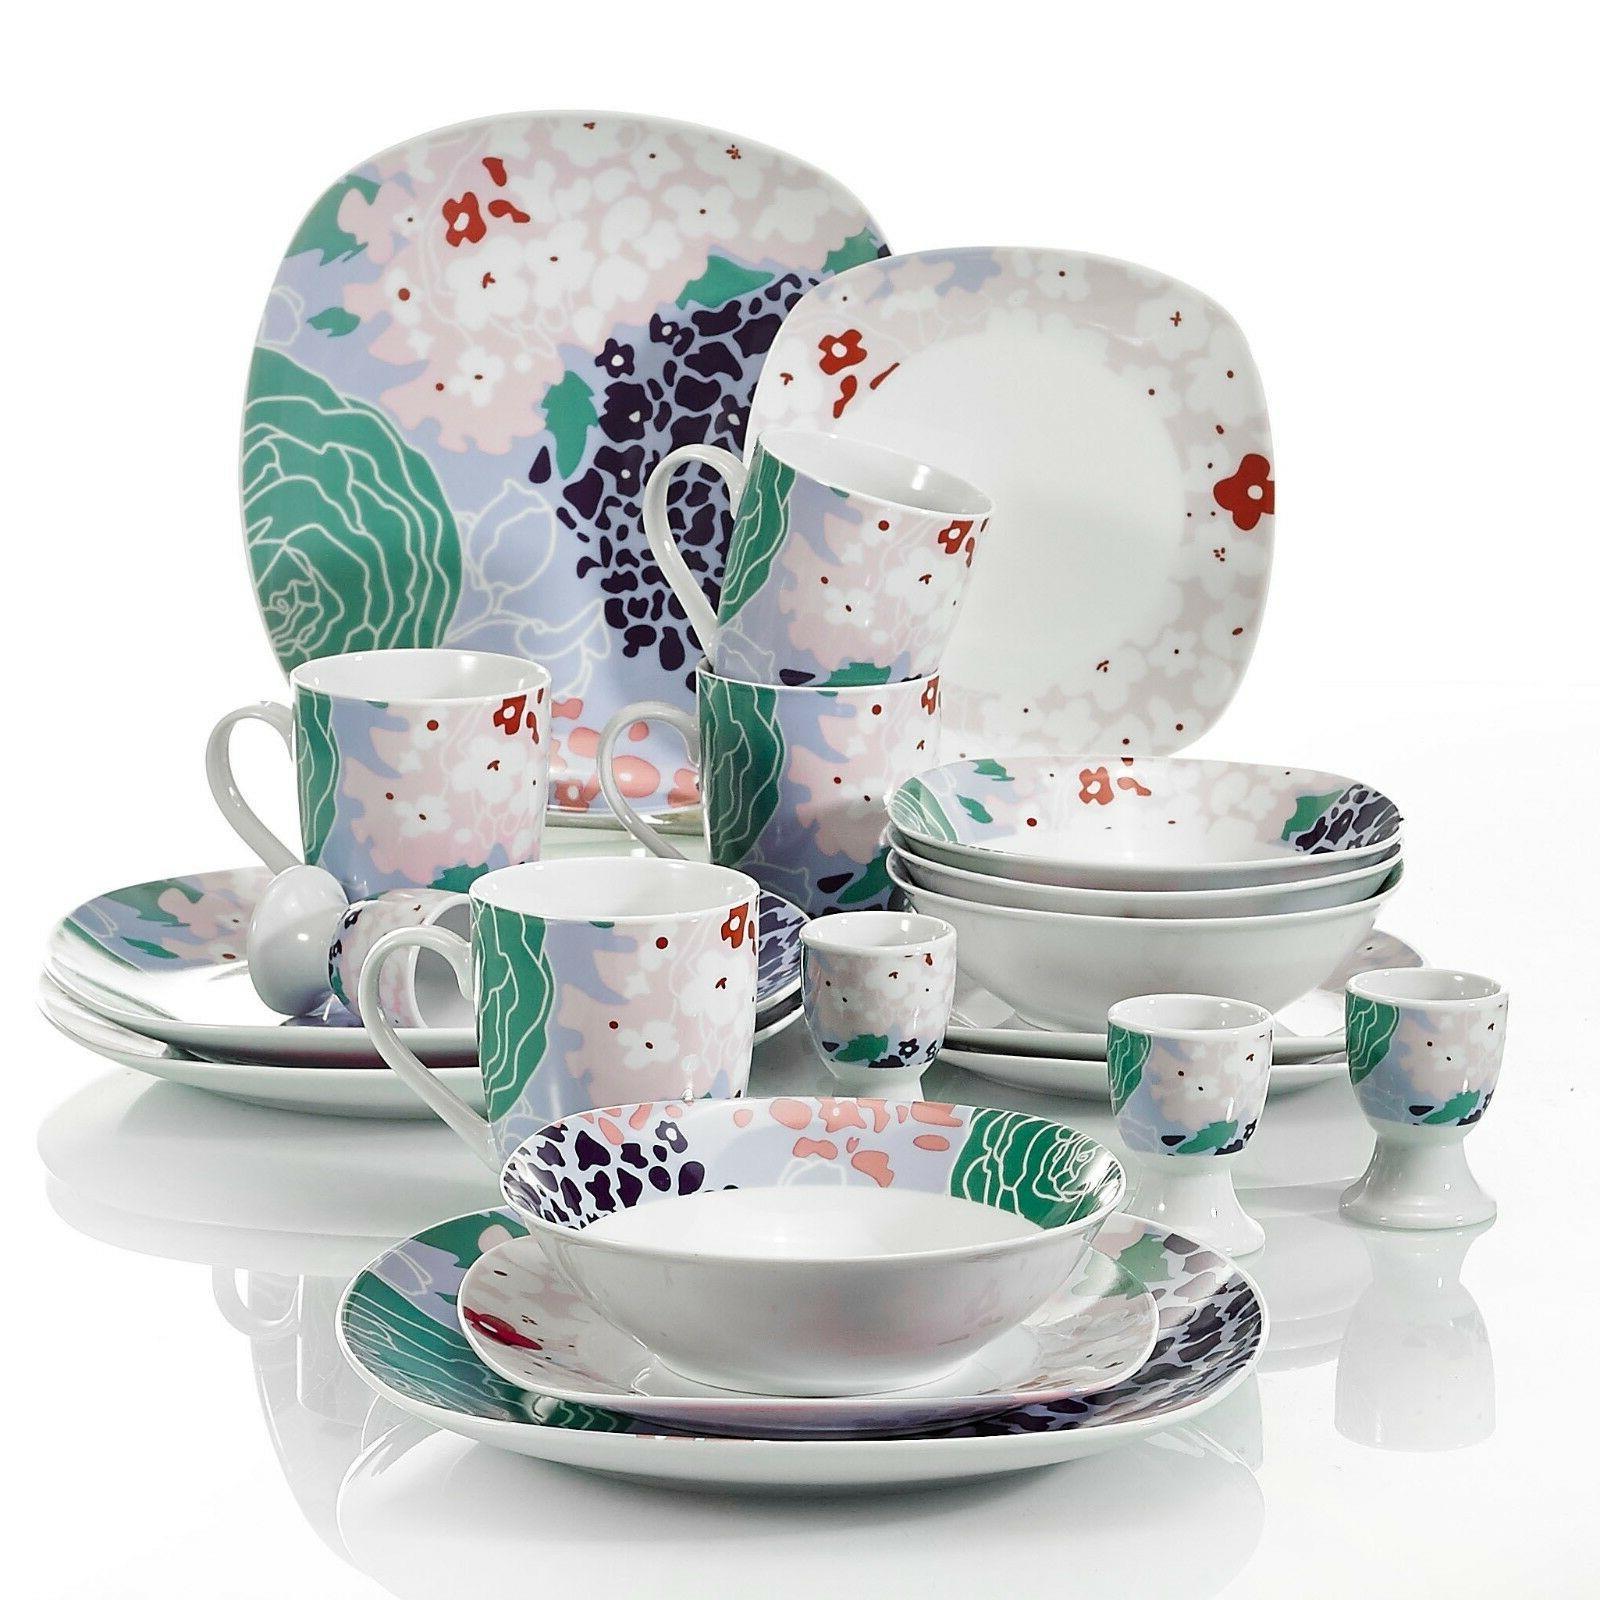 VEWEET color Patterns Plate Sets